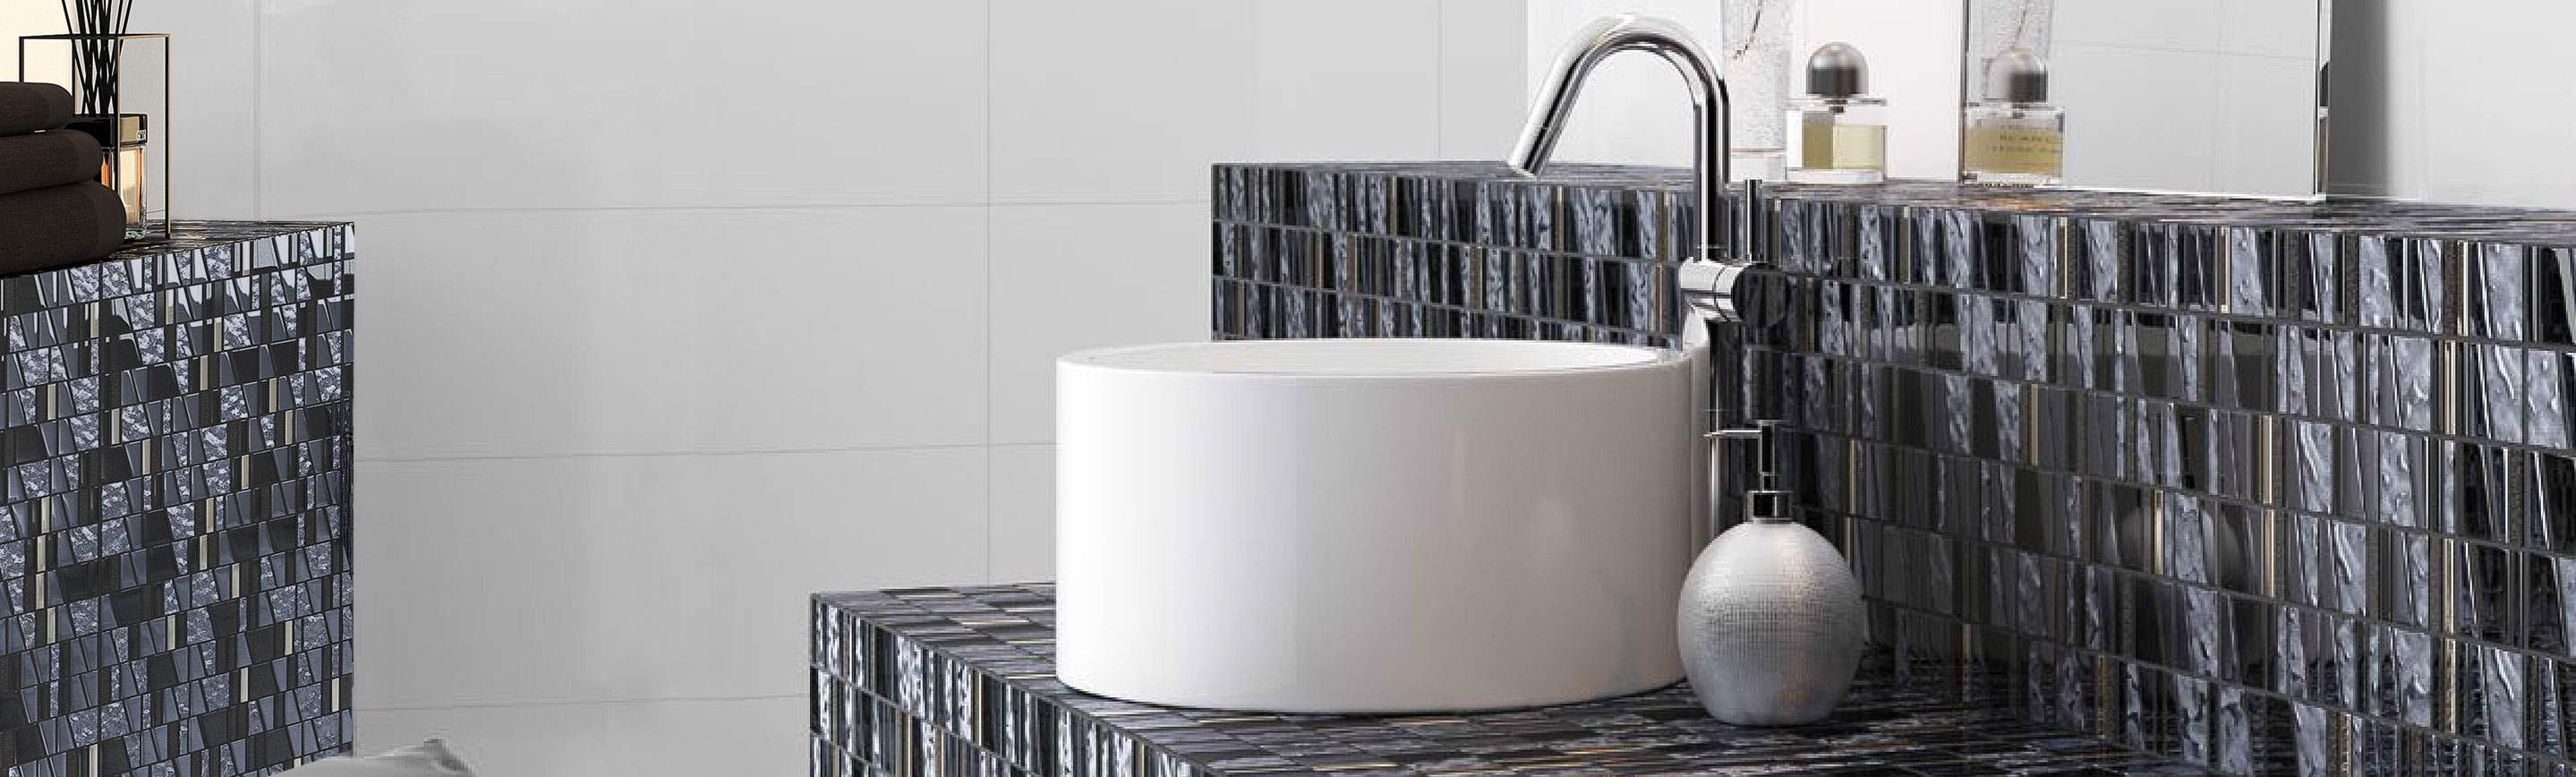 Ocean Mosaics Tiles Shop Online Kitchen Tile Bathroom Tile Pool Tile